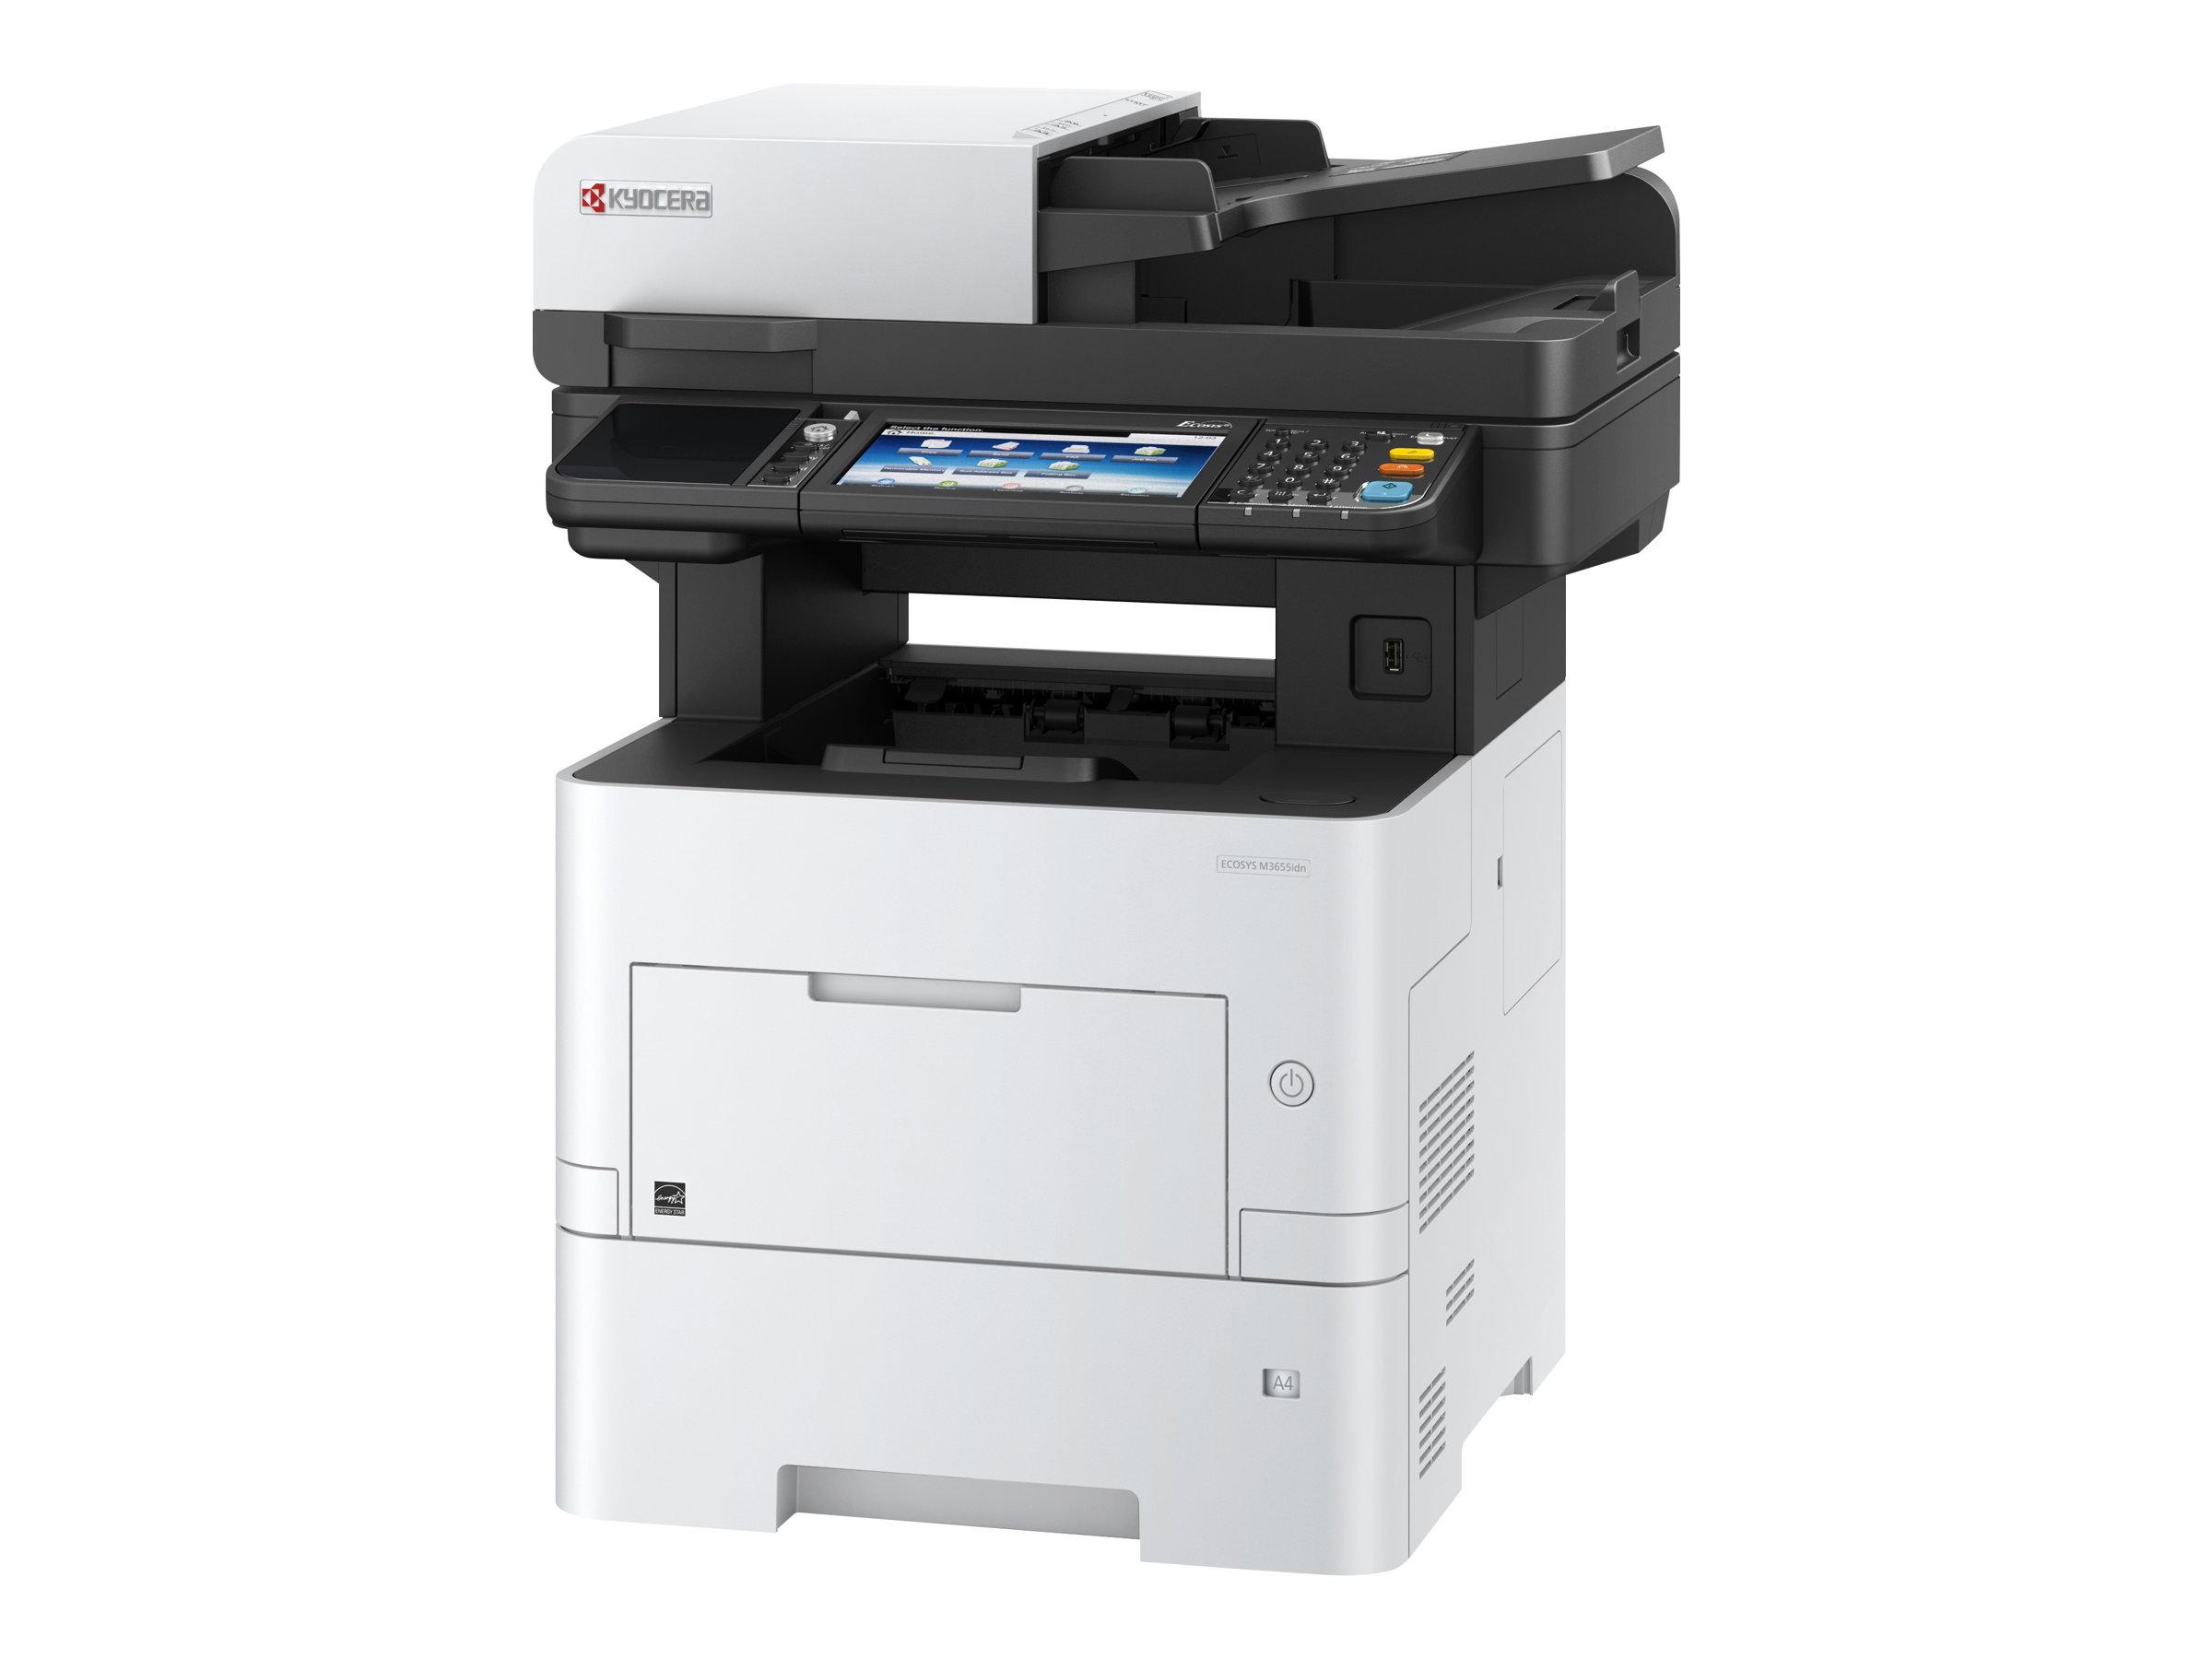 Kyocera ECOSYS M3655idn - Multifunktionsdrucker - s/w - Laser - A4 (210 x 297 mm)